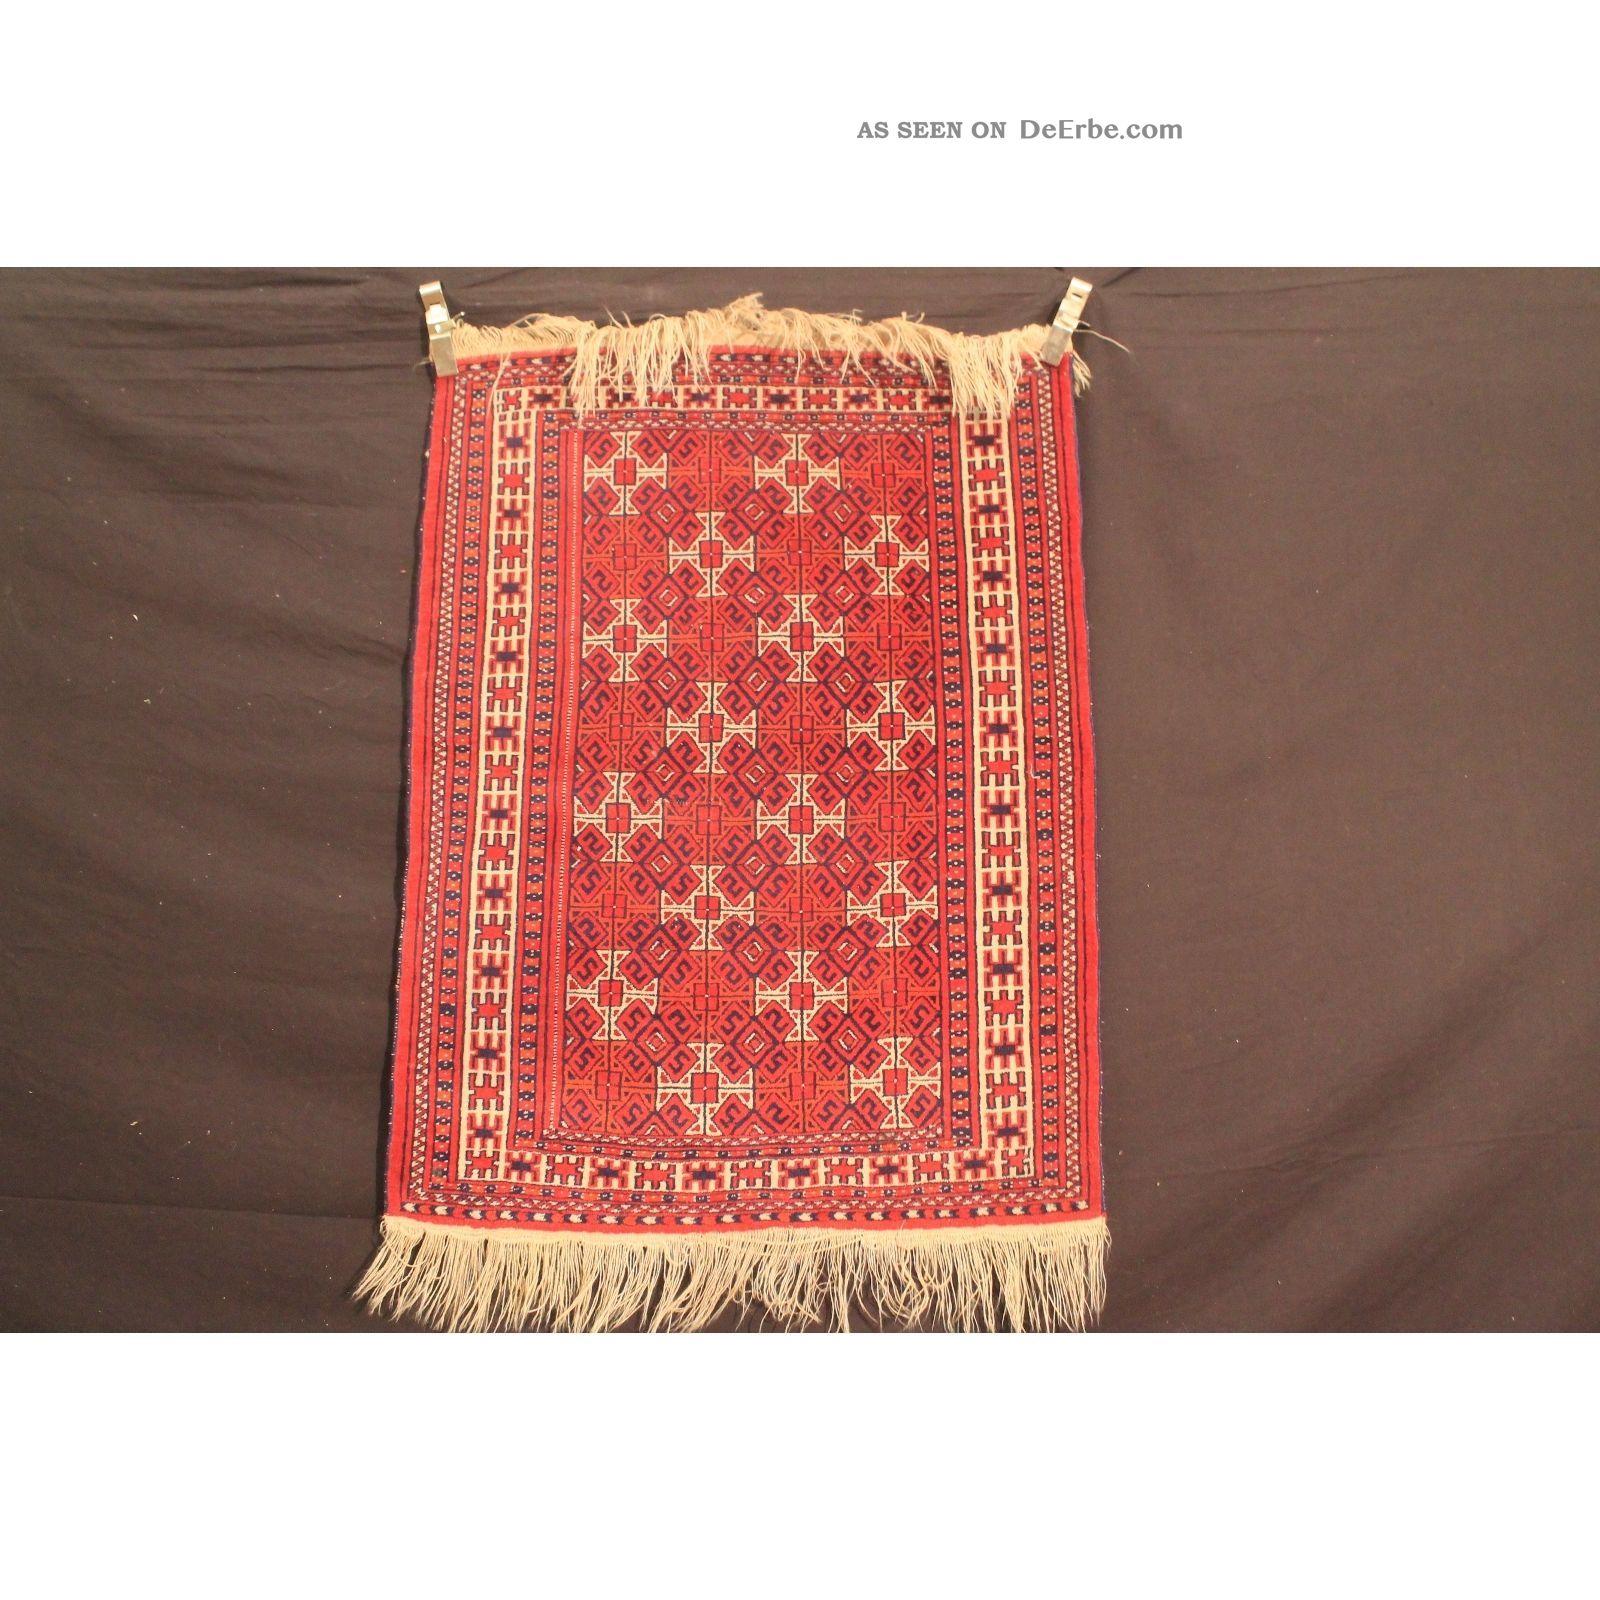 Antik Handgeknüpft Orient Teppich Udssr Turkman Jomut Old Rug Carpet 95x125cm Teppiche & Flachgewebe Bild